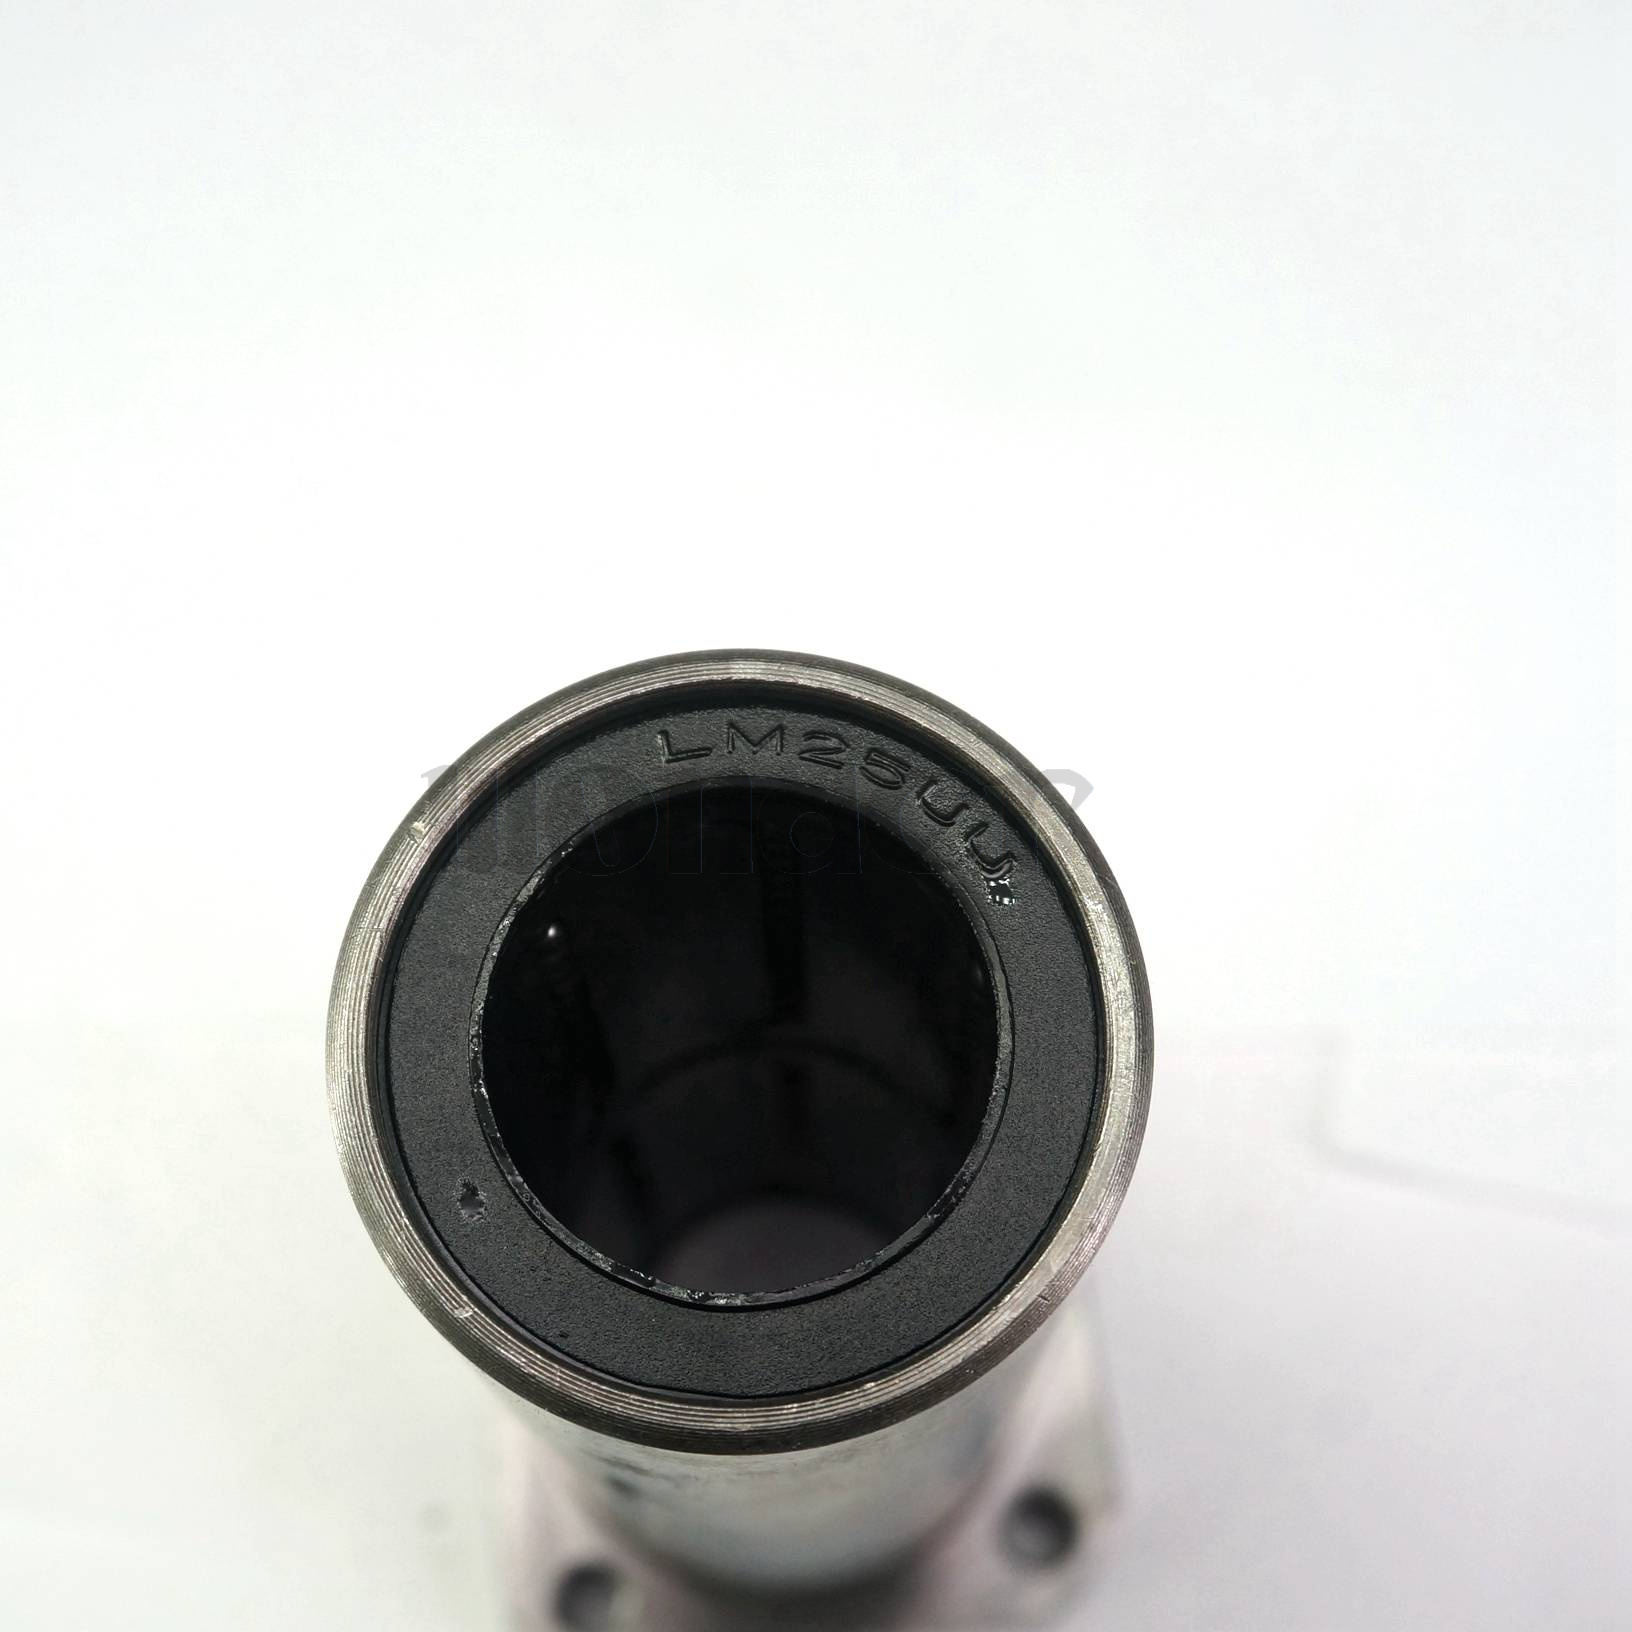 LMK25LUU Square Flange Linear Bearing 25x40x62x112mm Ball Bushing Motion CNC